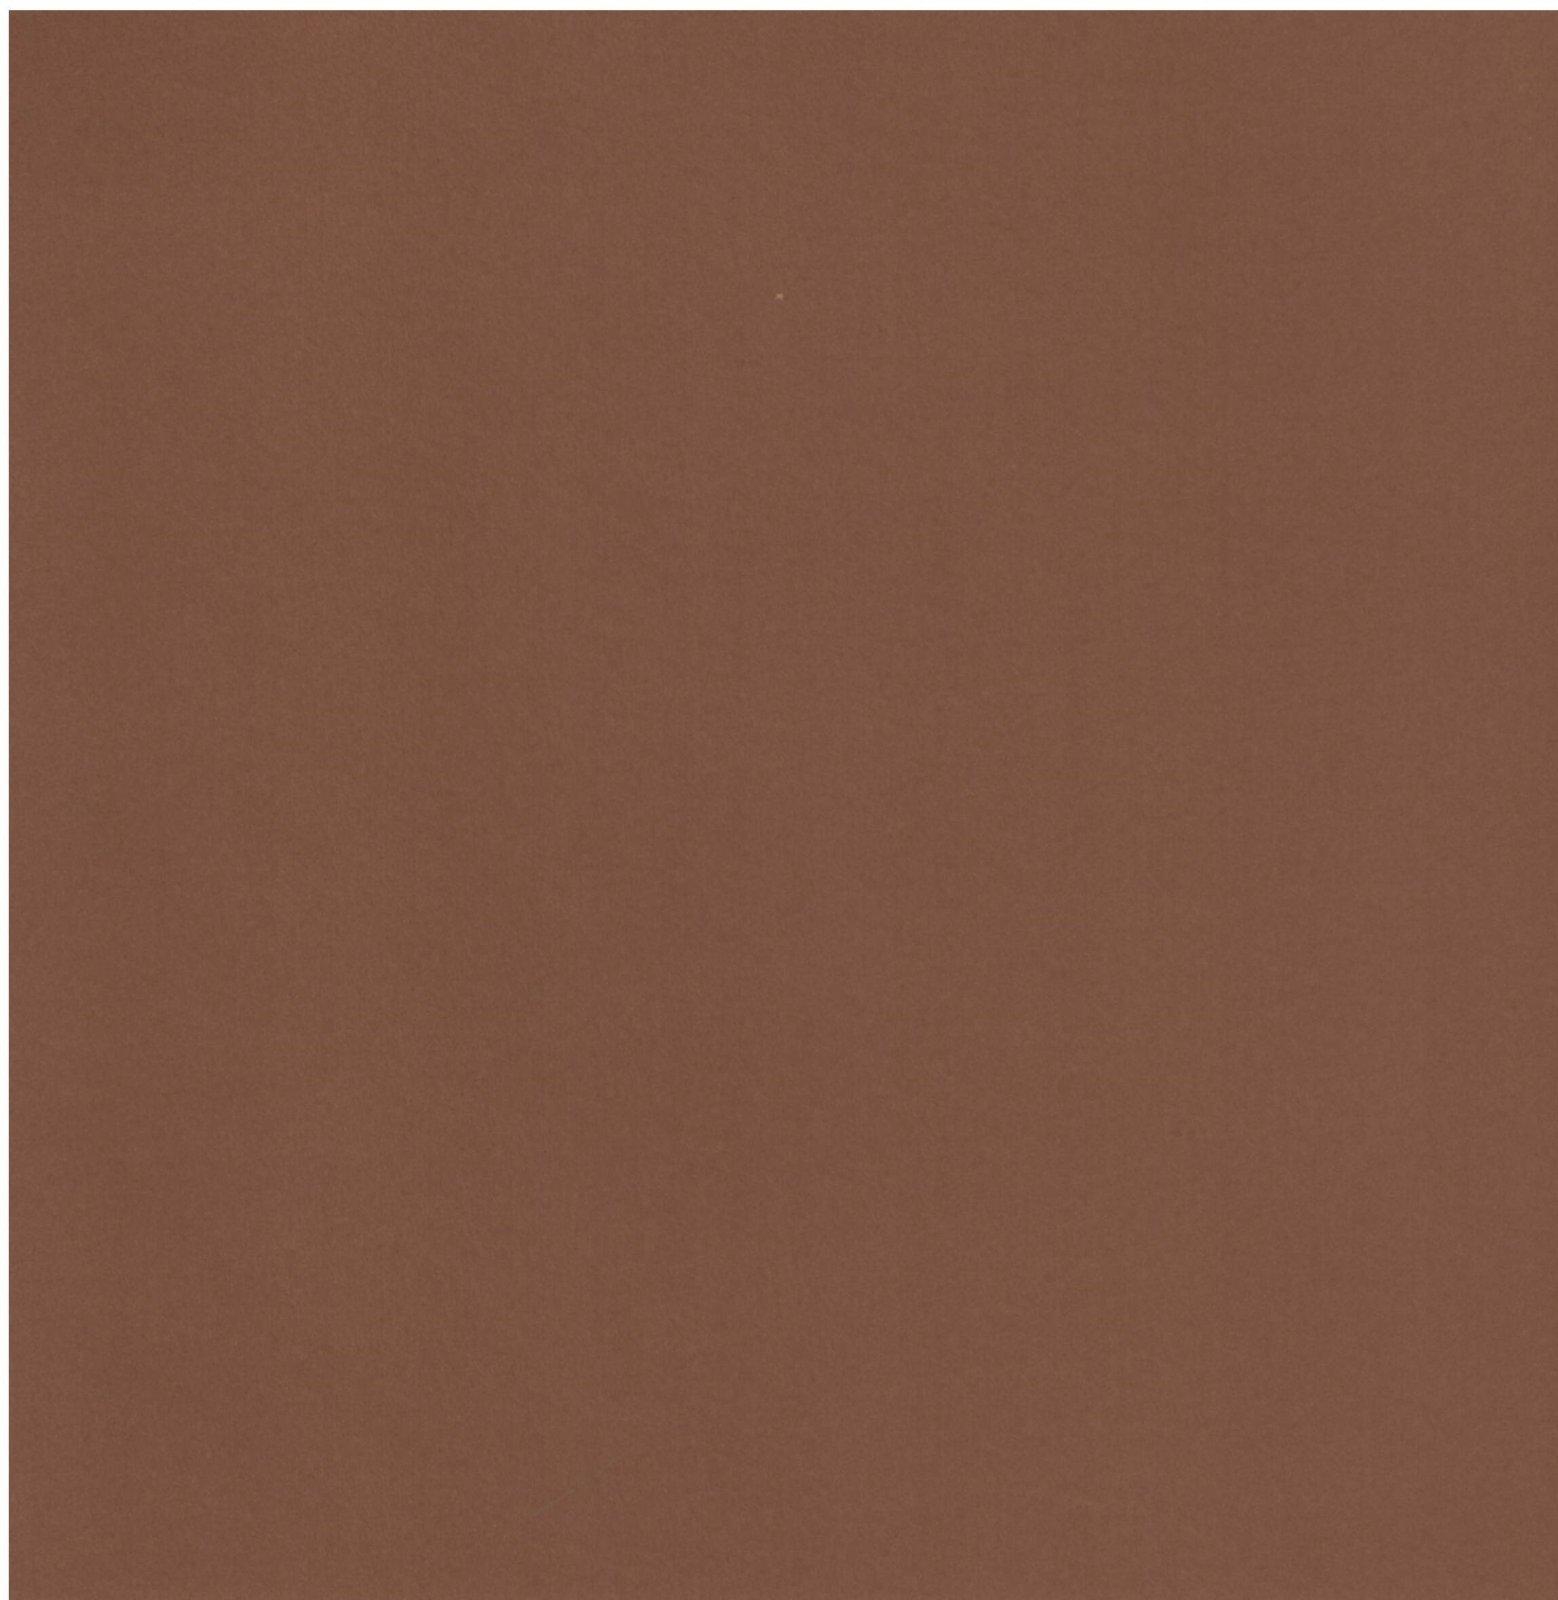 AC Cardstock 12X12 doux/lisse Chocolat 80lbs - Smooth Cardstock Chocolate,Item # 71773